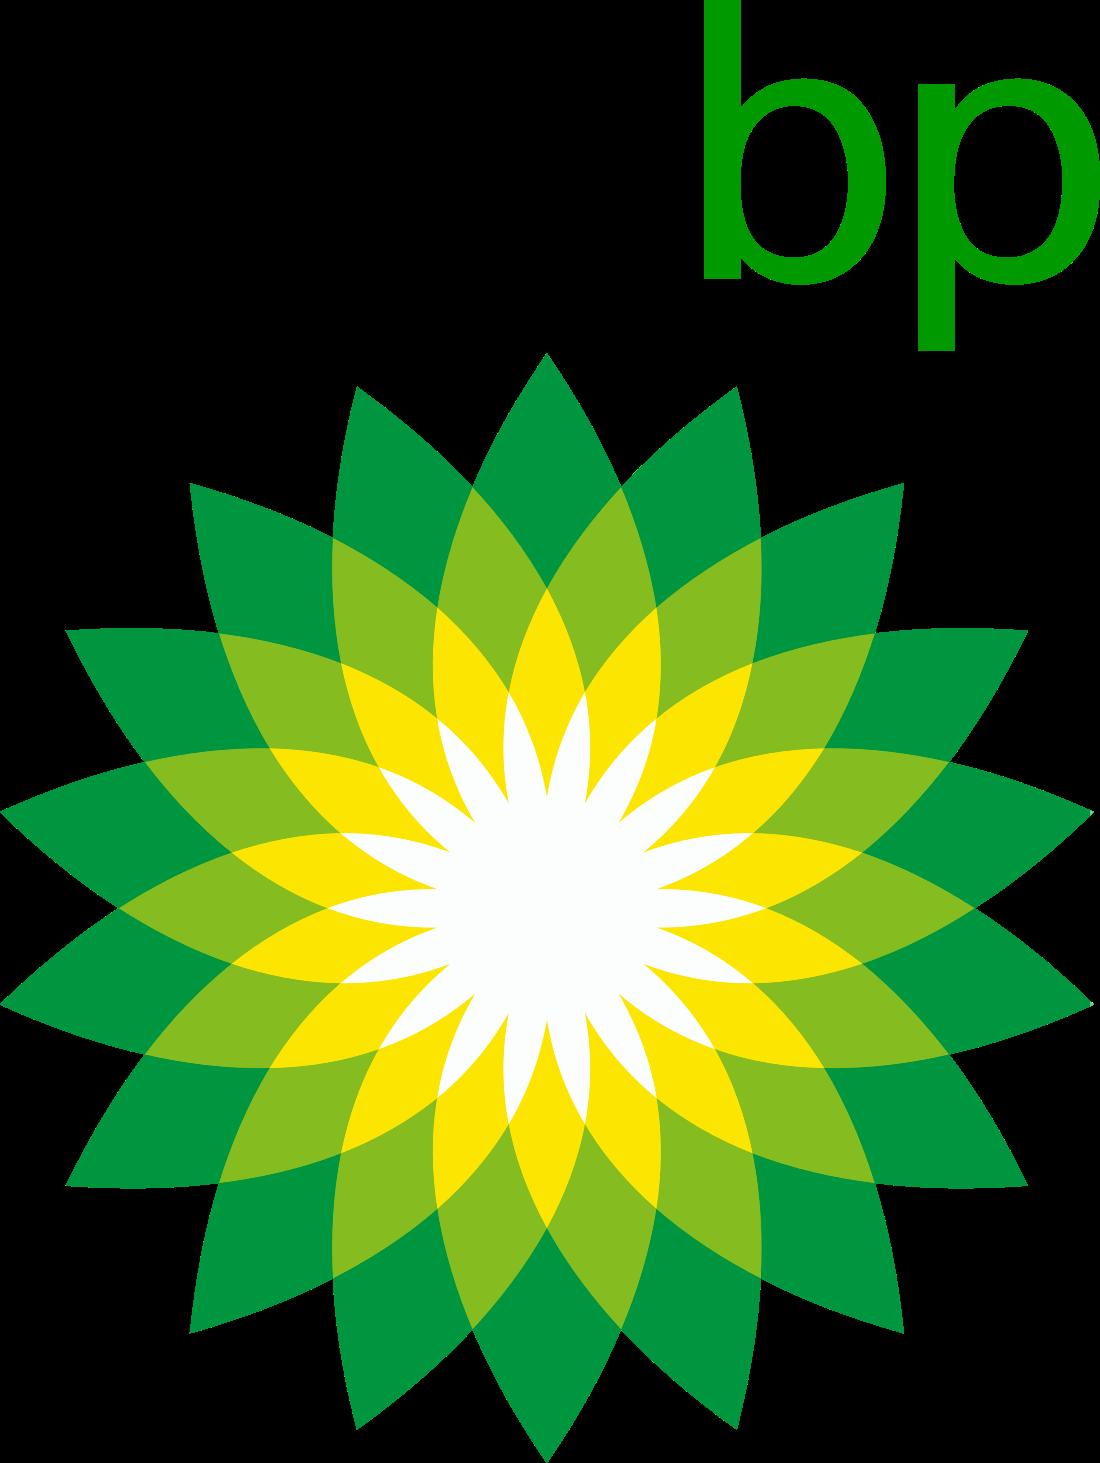 bp logo 3 - BP Logo